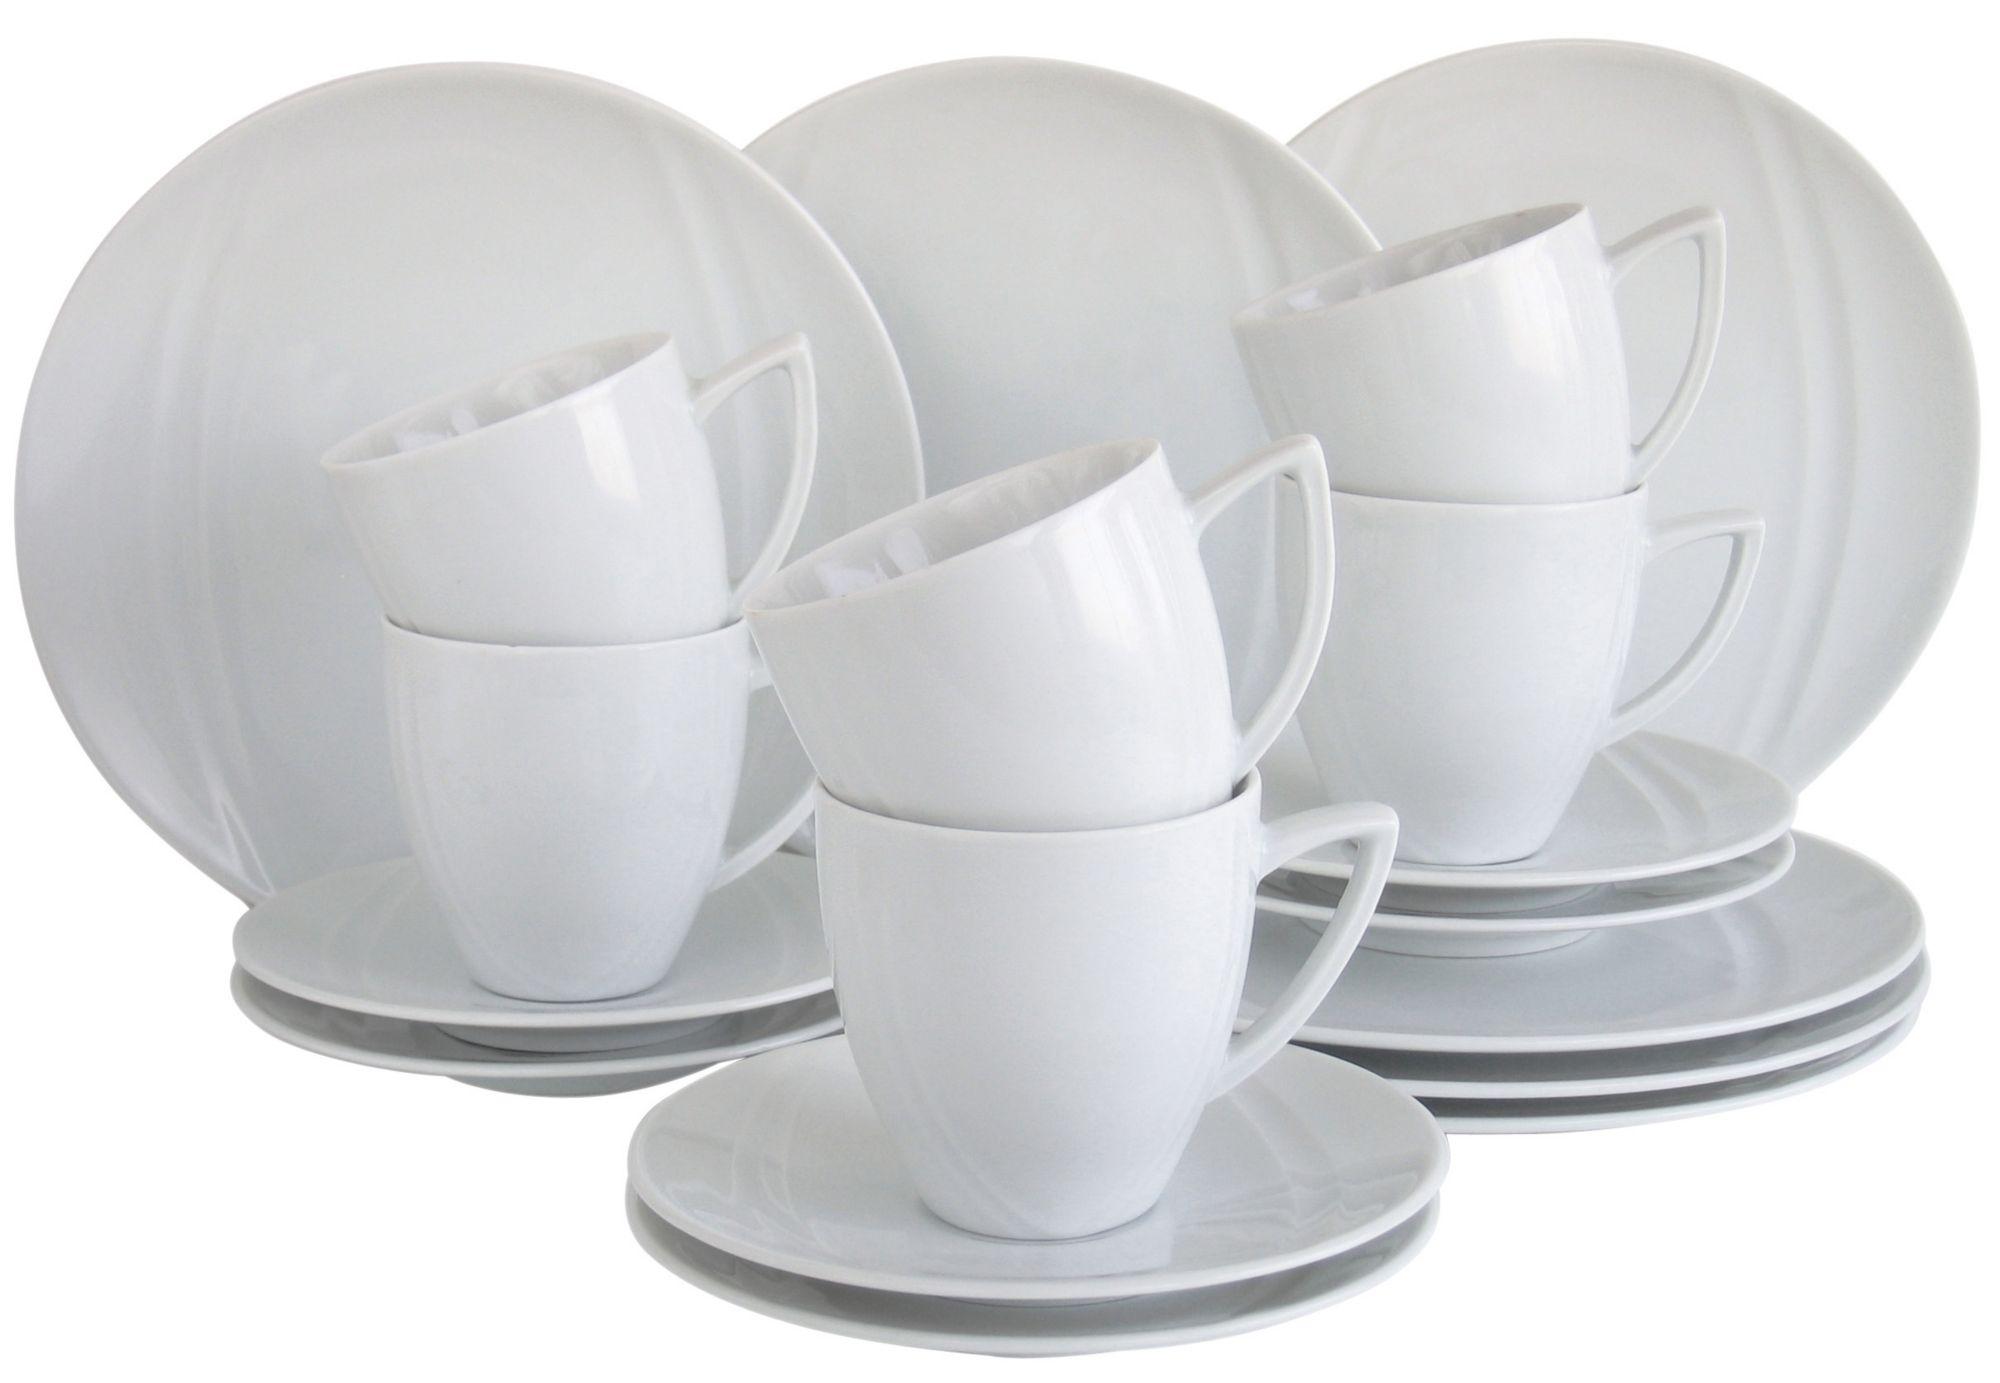 CREATABLE CreaTable Kaffeeservice, Porzellan, 18 Teile, »CARAT«